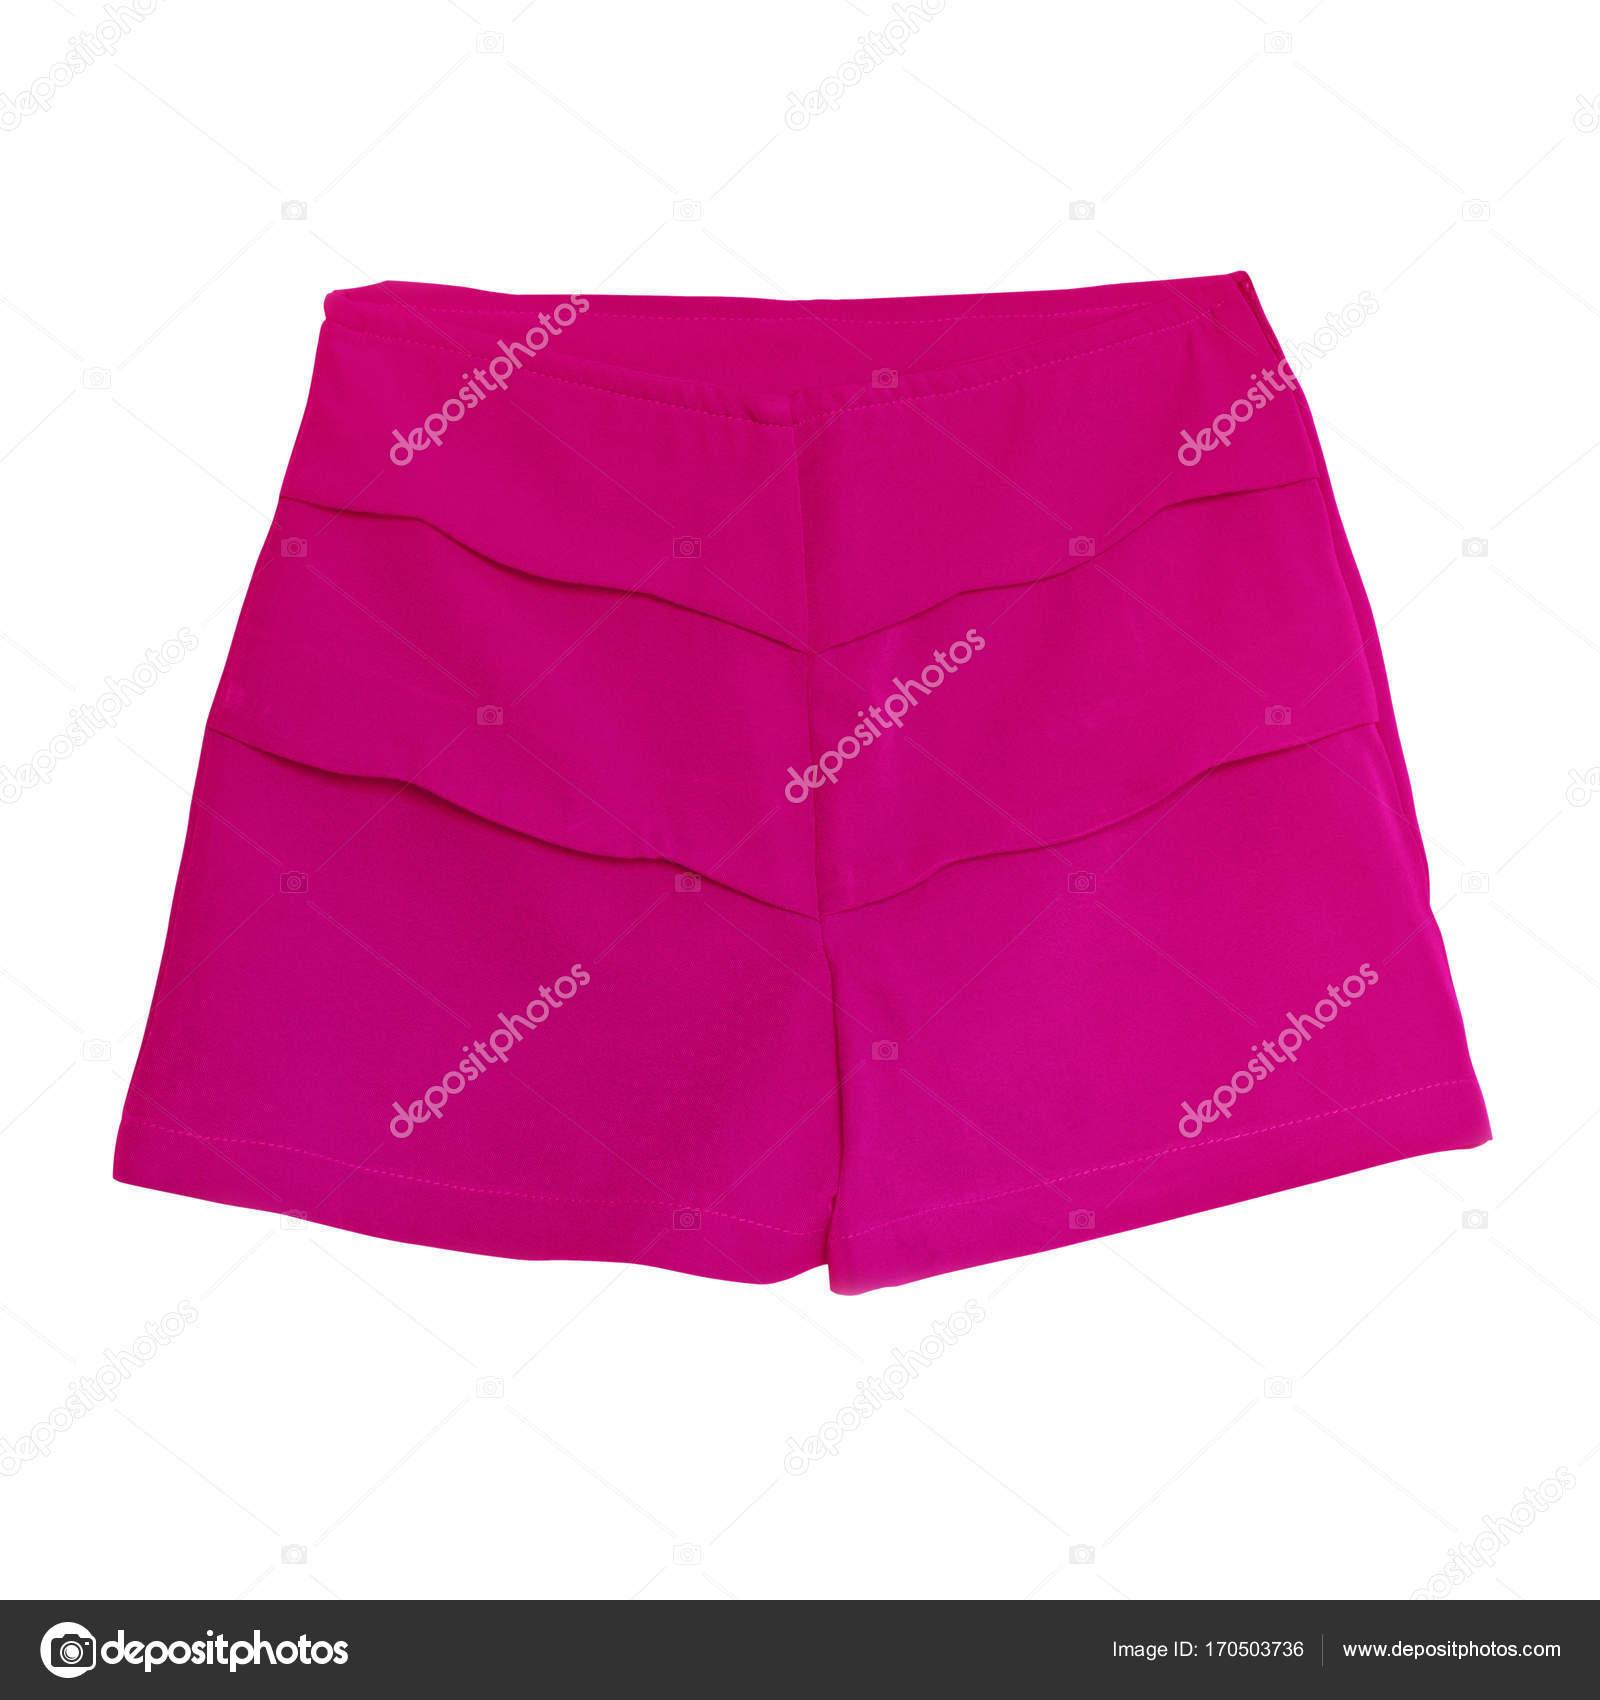 Pantalón Trabajo Blanco Con Pinkk Corto Mujer Aislado Sobre Fondo mNn0wvyOP8